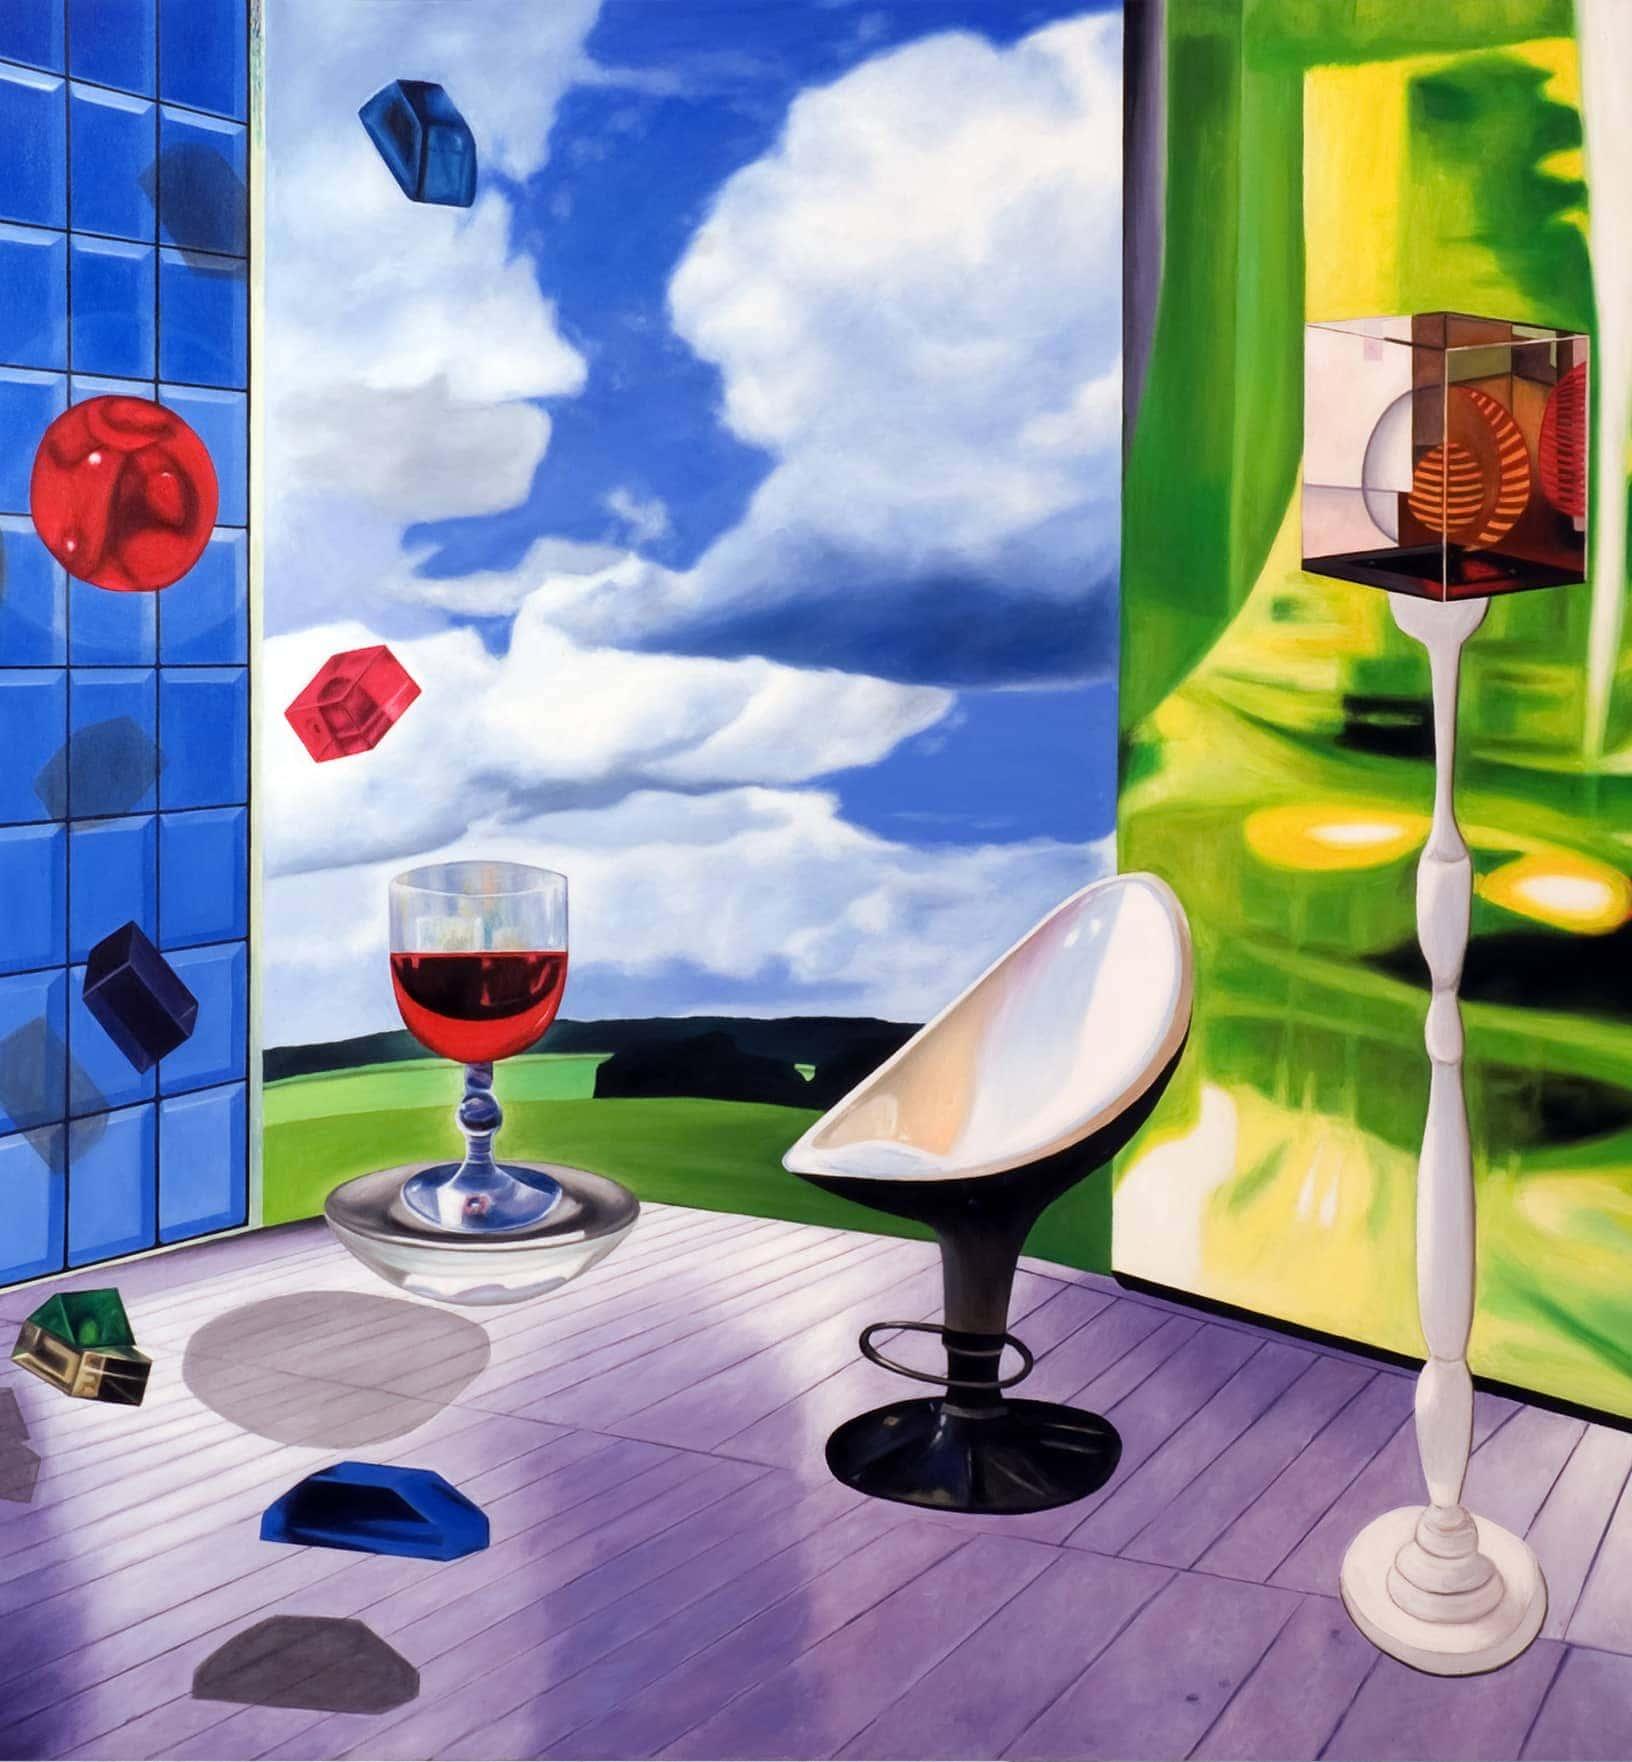 acrylbilder malen lassen auftragsmalerei